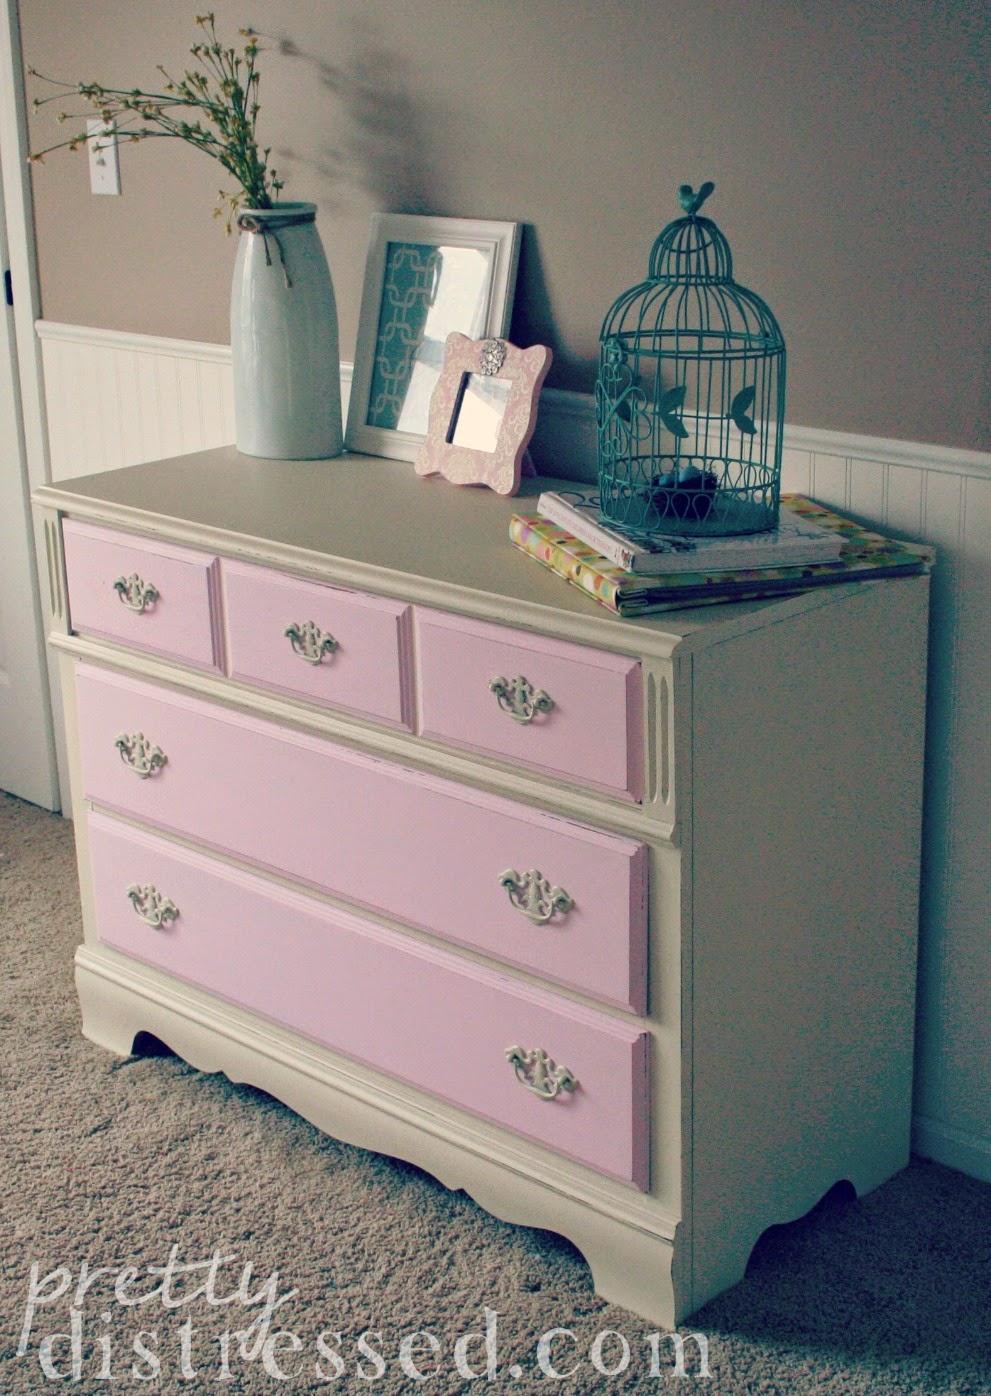 Pink Dressers For Girls Bedroom Set: Pretty Distressed: Girly Girl Dresser Reveal